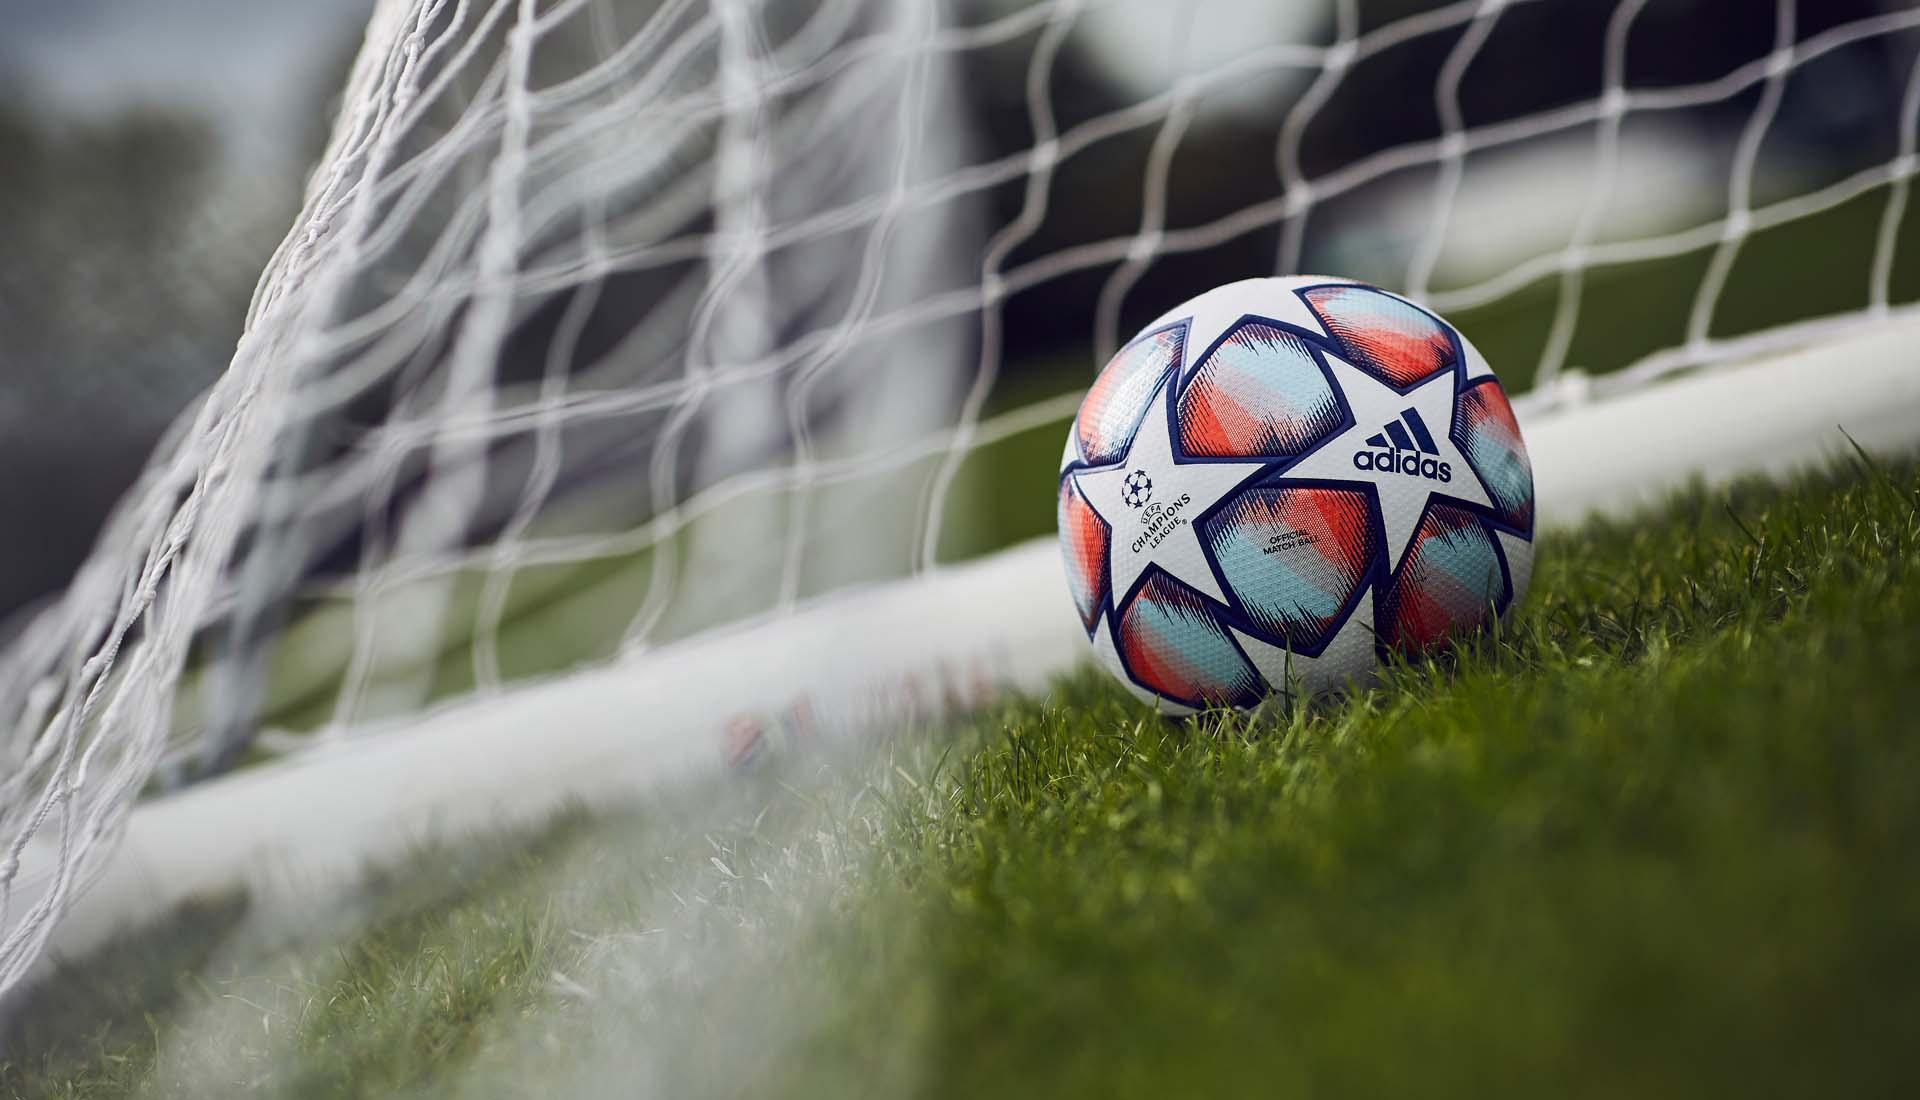 Champions League Free Tv 2021